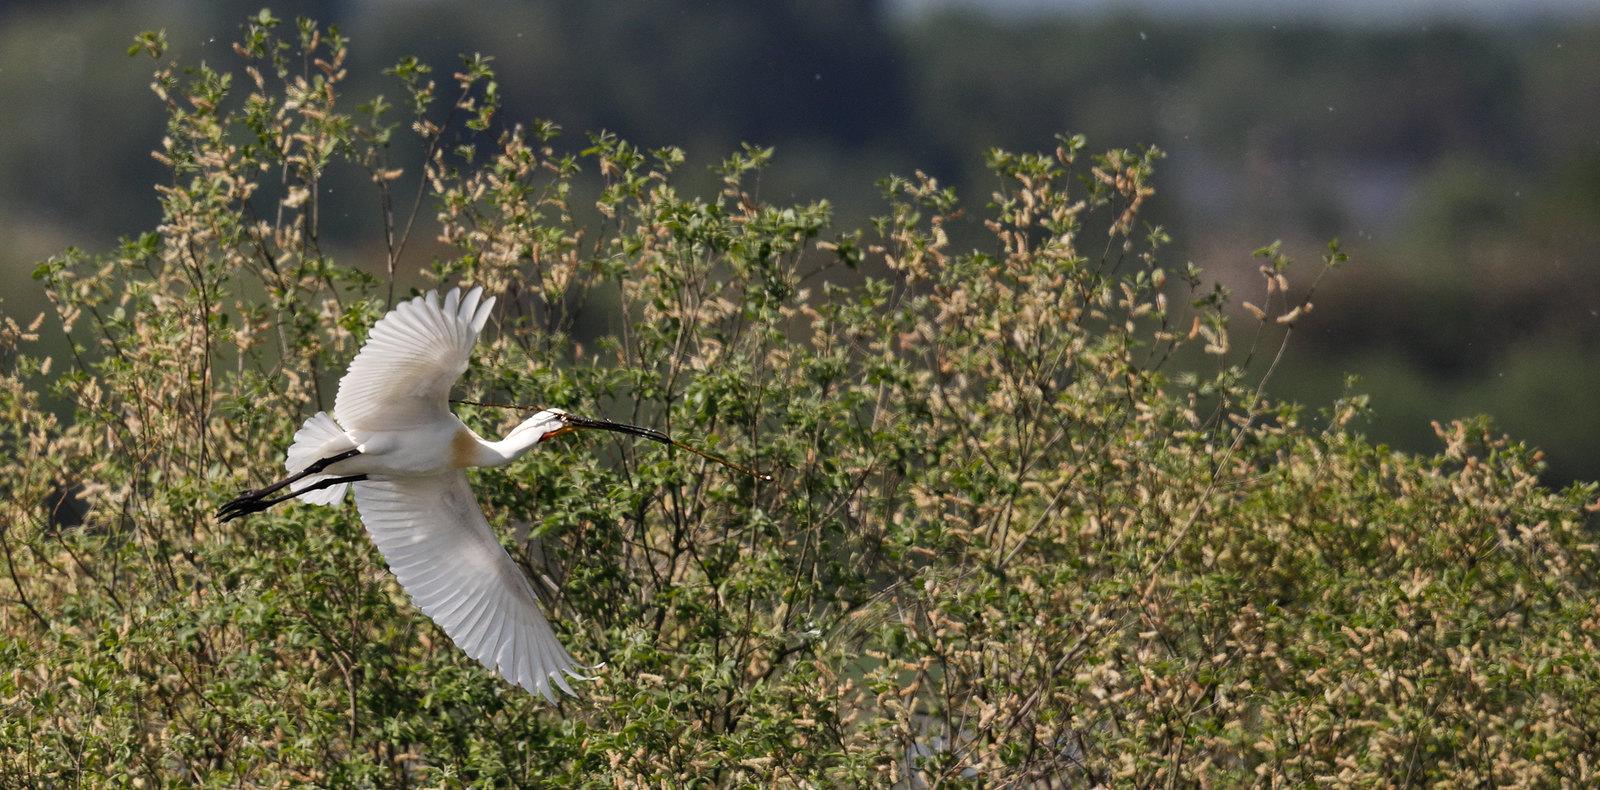 Distant Spoonbill - nest building